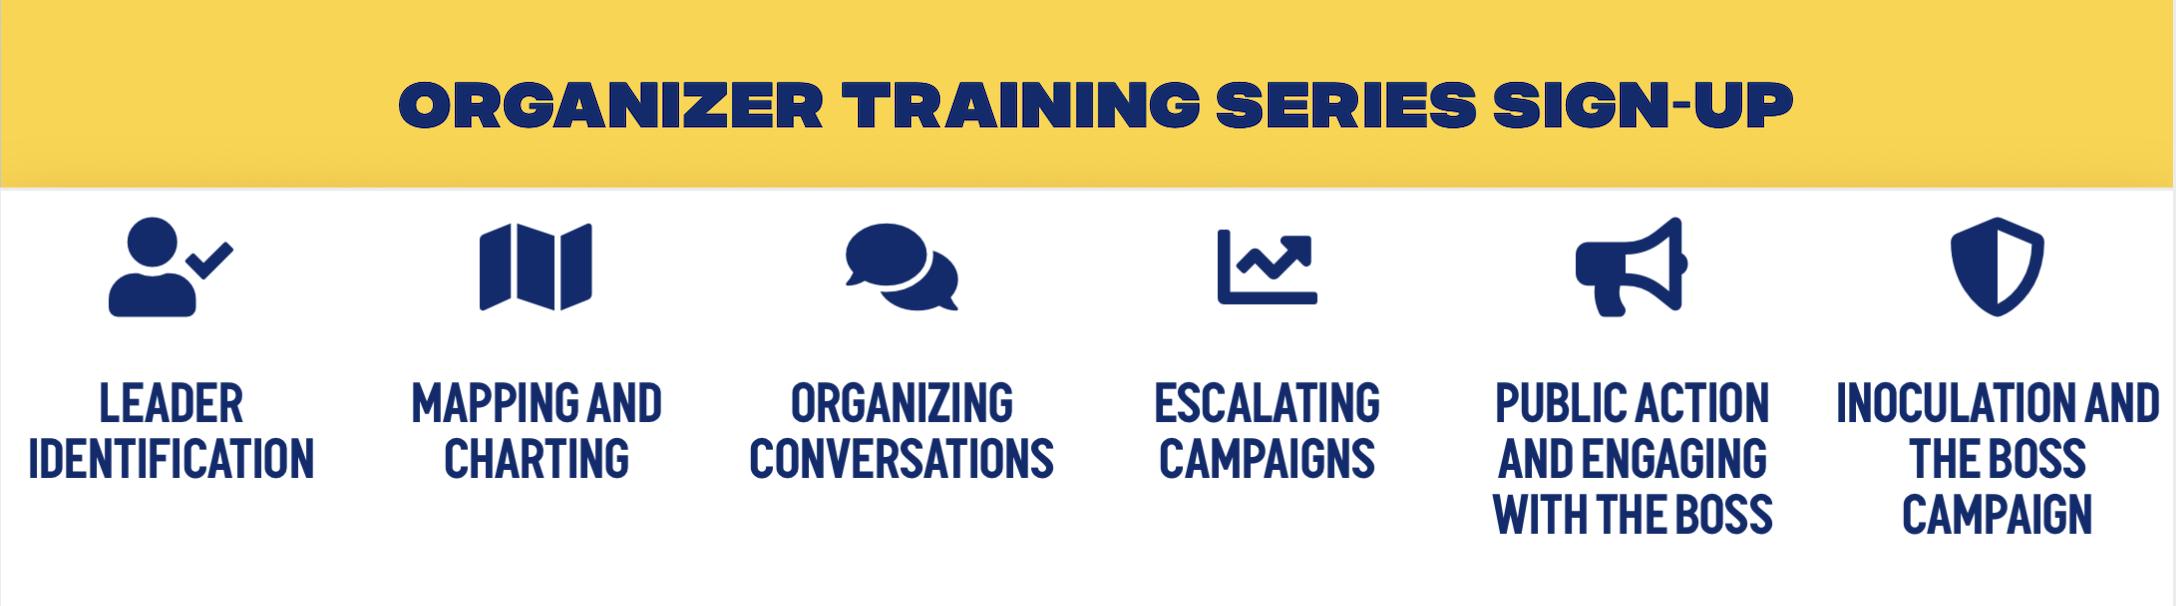 Emergency Workplace Organizing Committee's Organizer Training Series @ Online